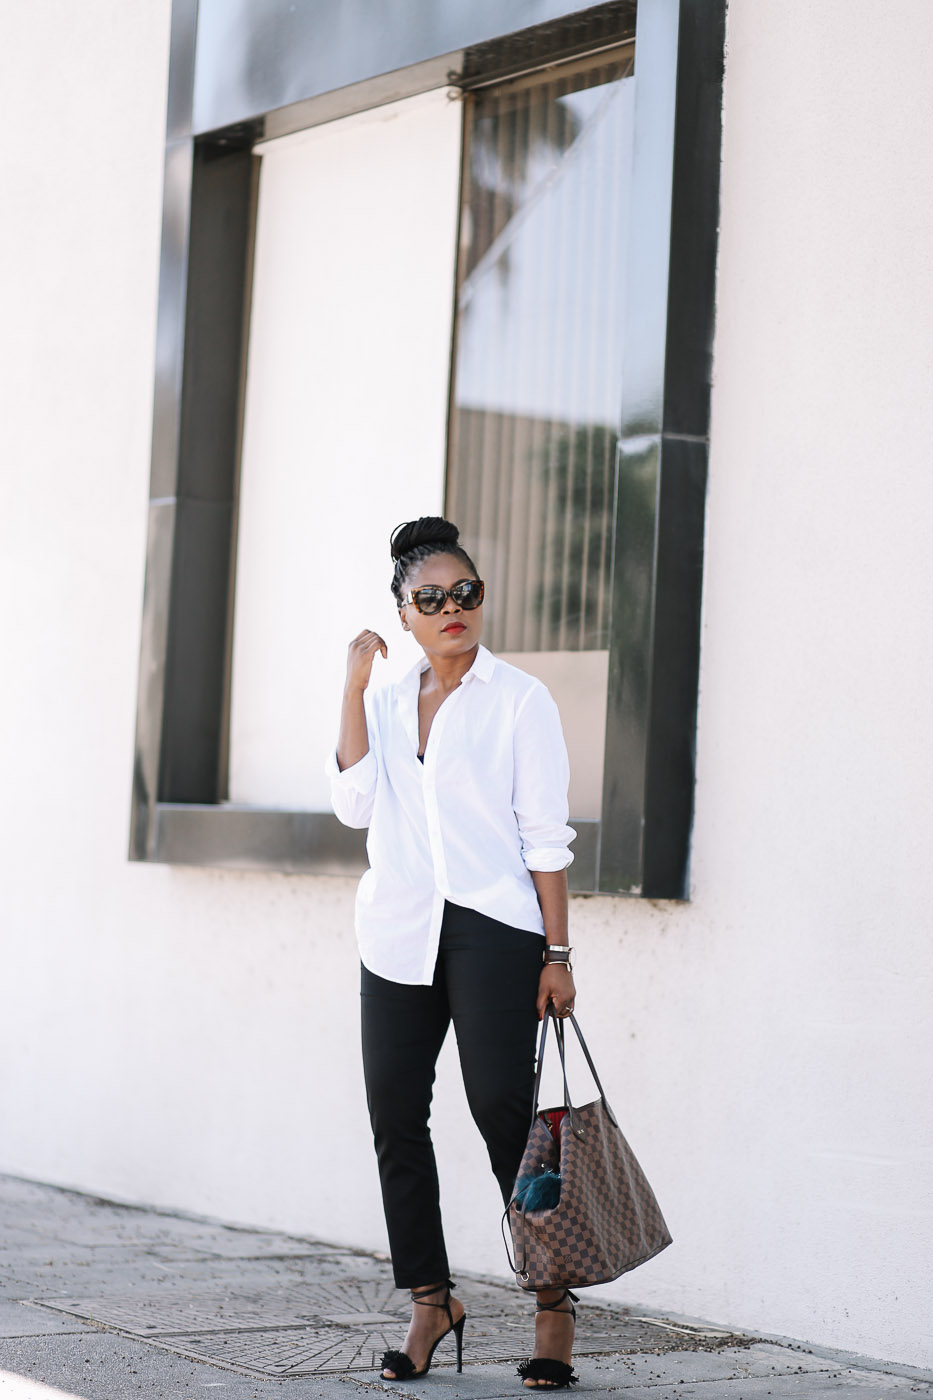 boyfriend shirt and Black slacks-2